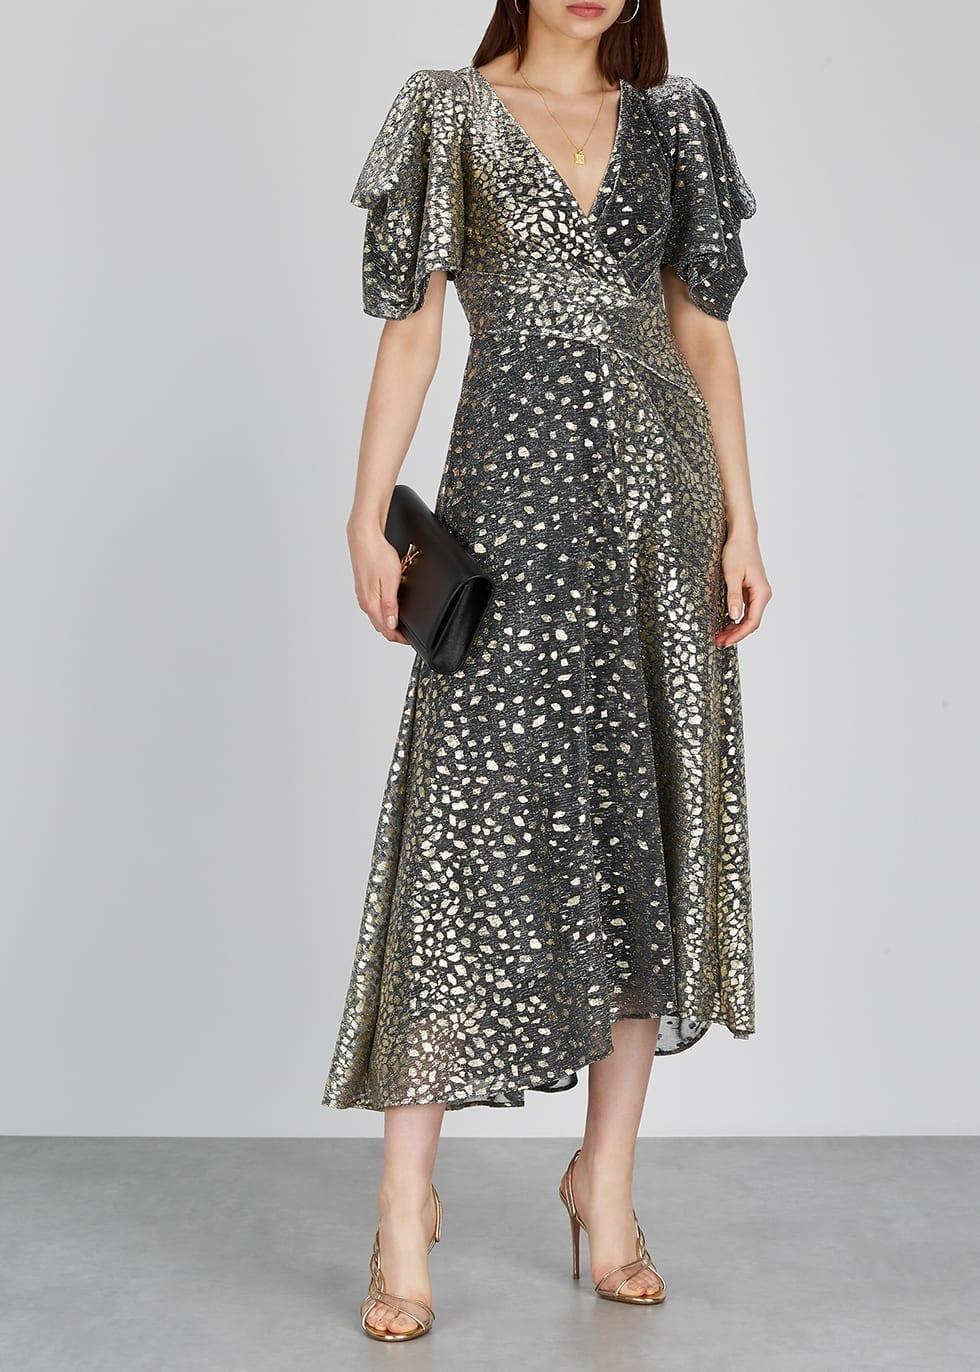 TALBOT RUNHOF Solfeggio Grey Foil-Print Midi Dress